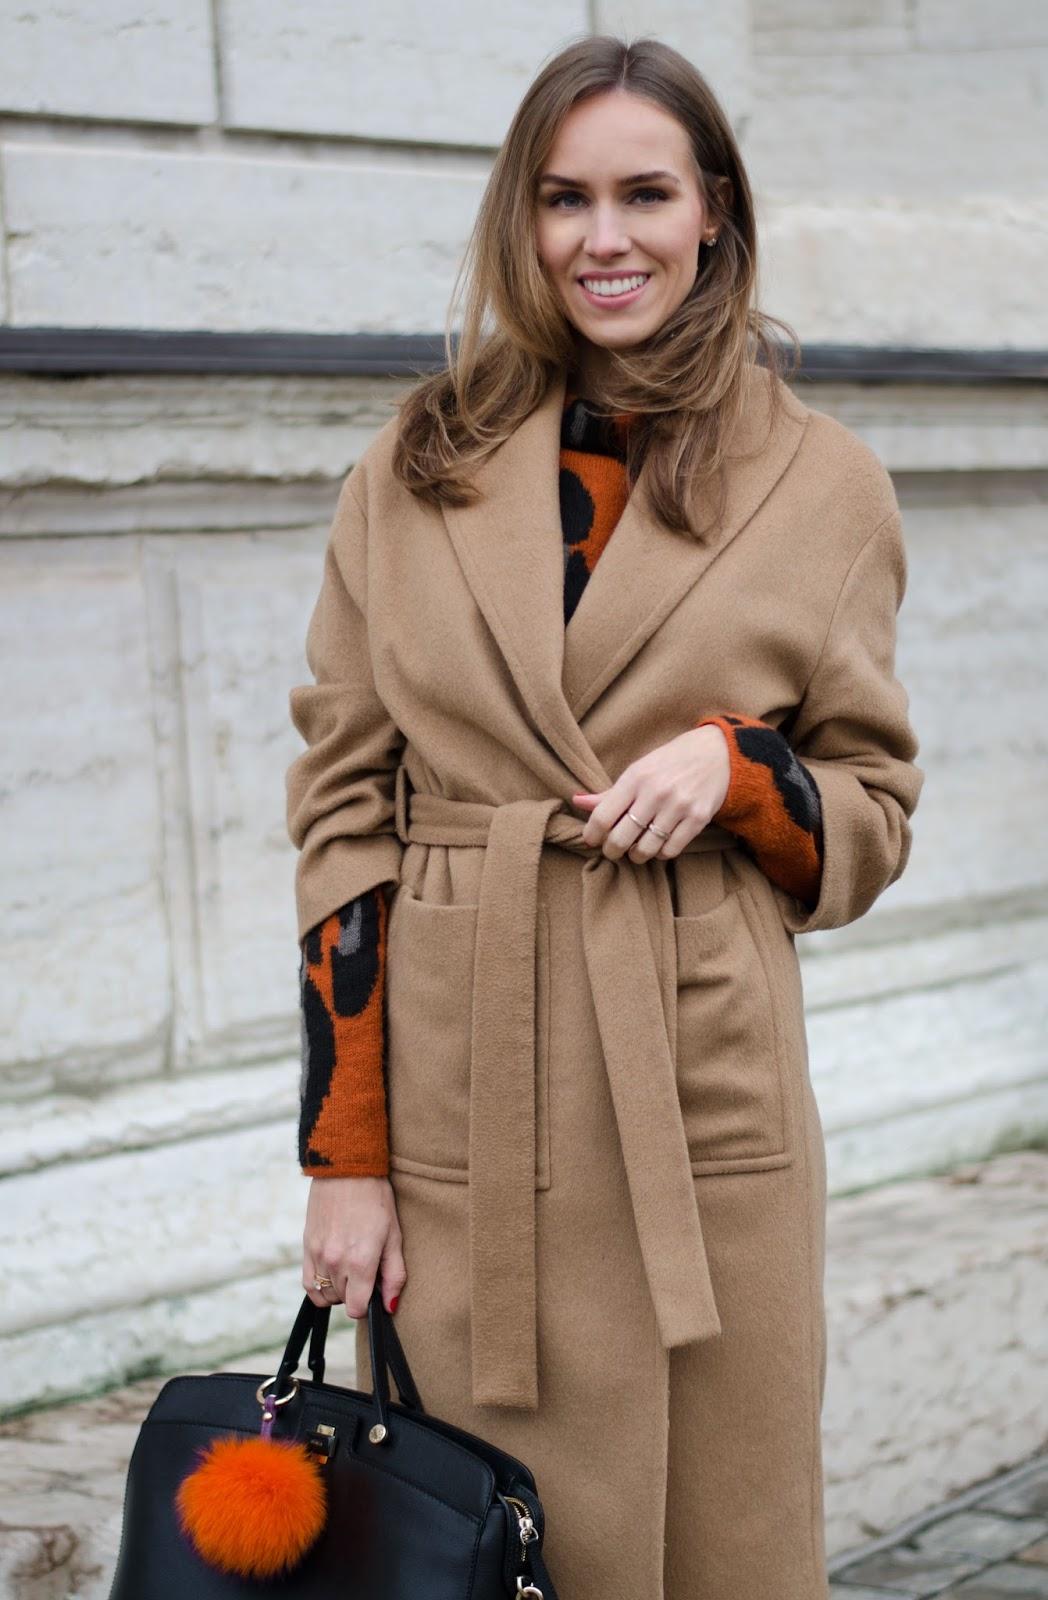 kristjaana mere mango camel coat leopard print sweater winter style